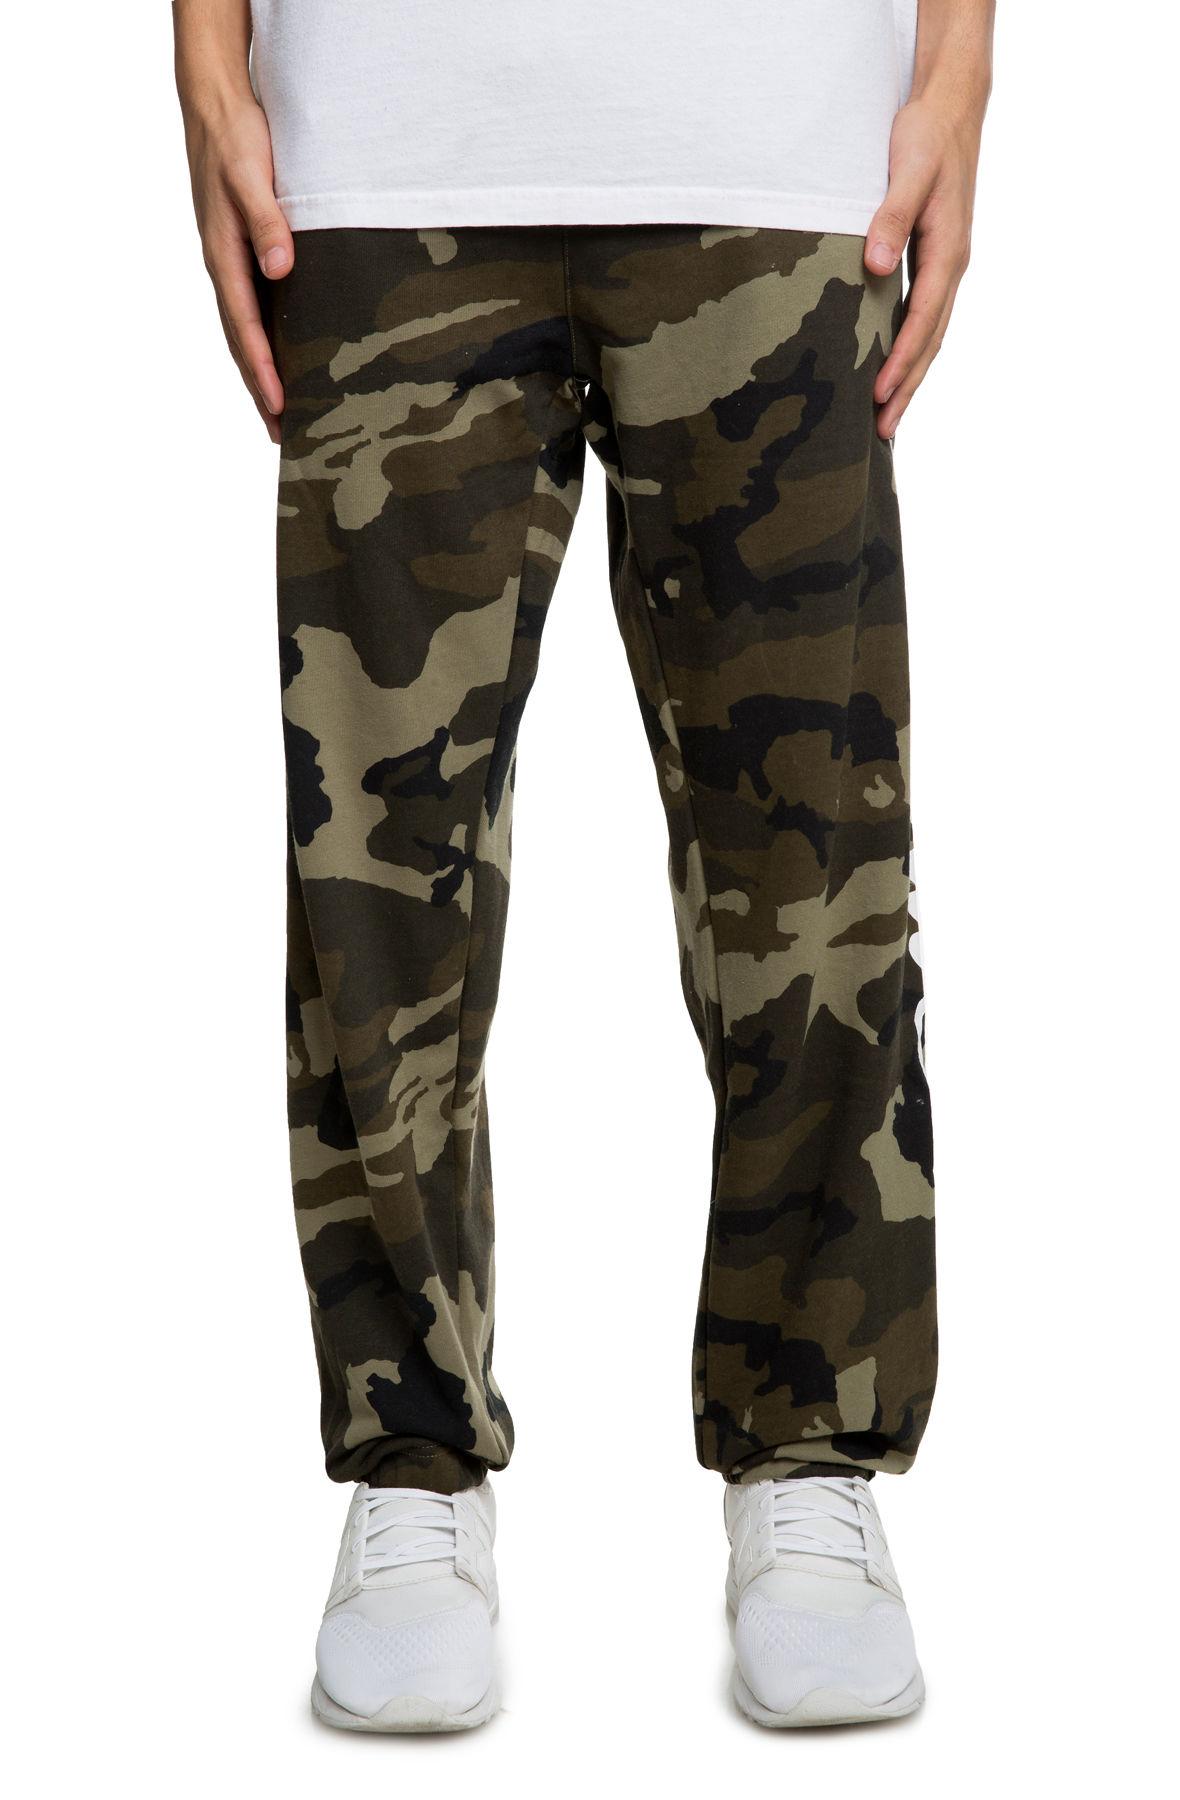 Image of The Nuevo Fleece Pants in Camo